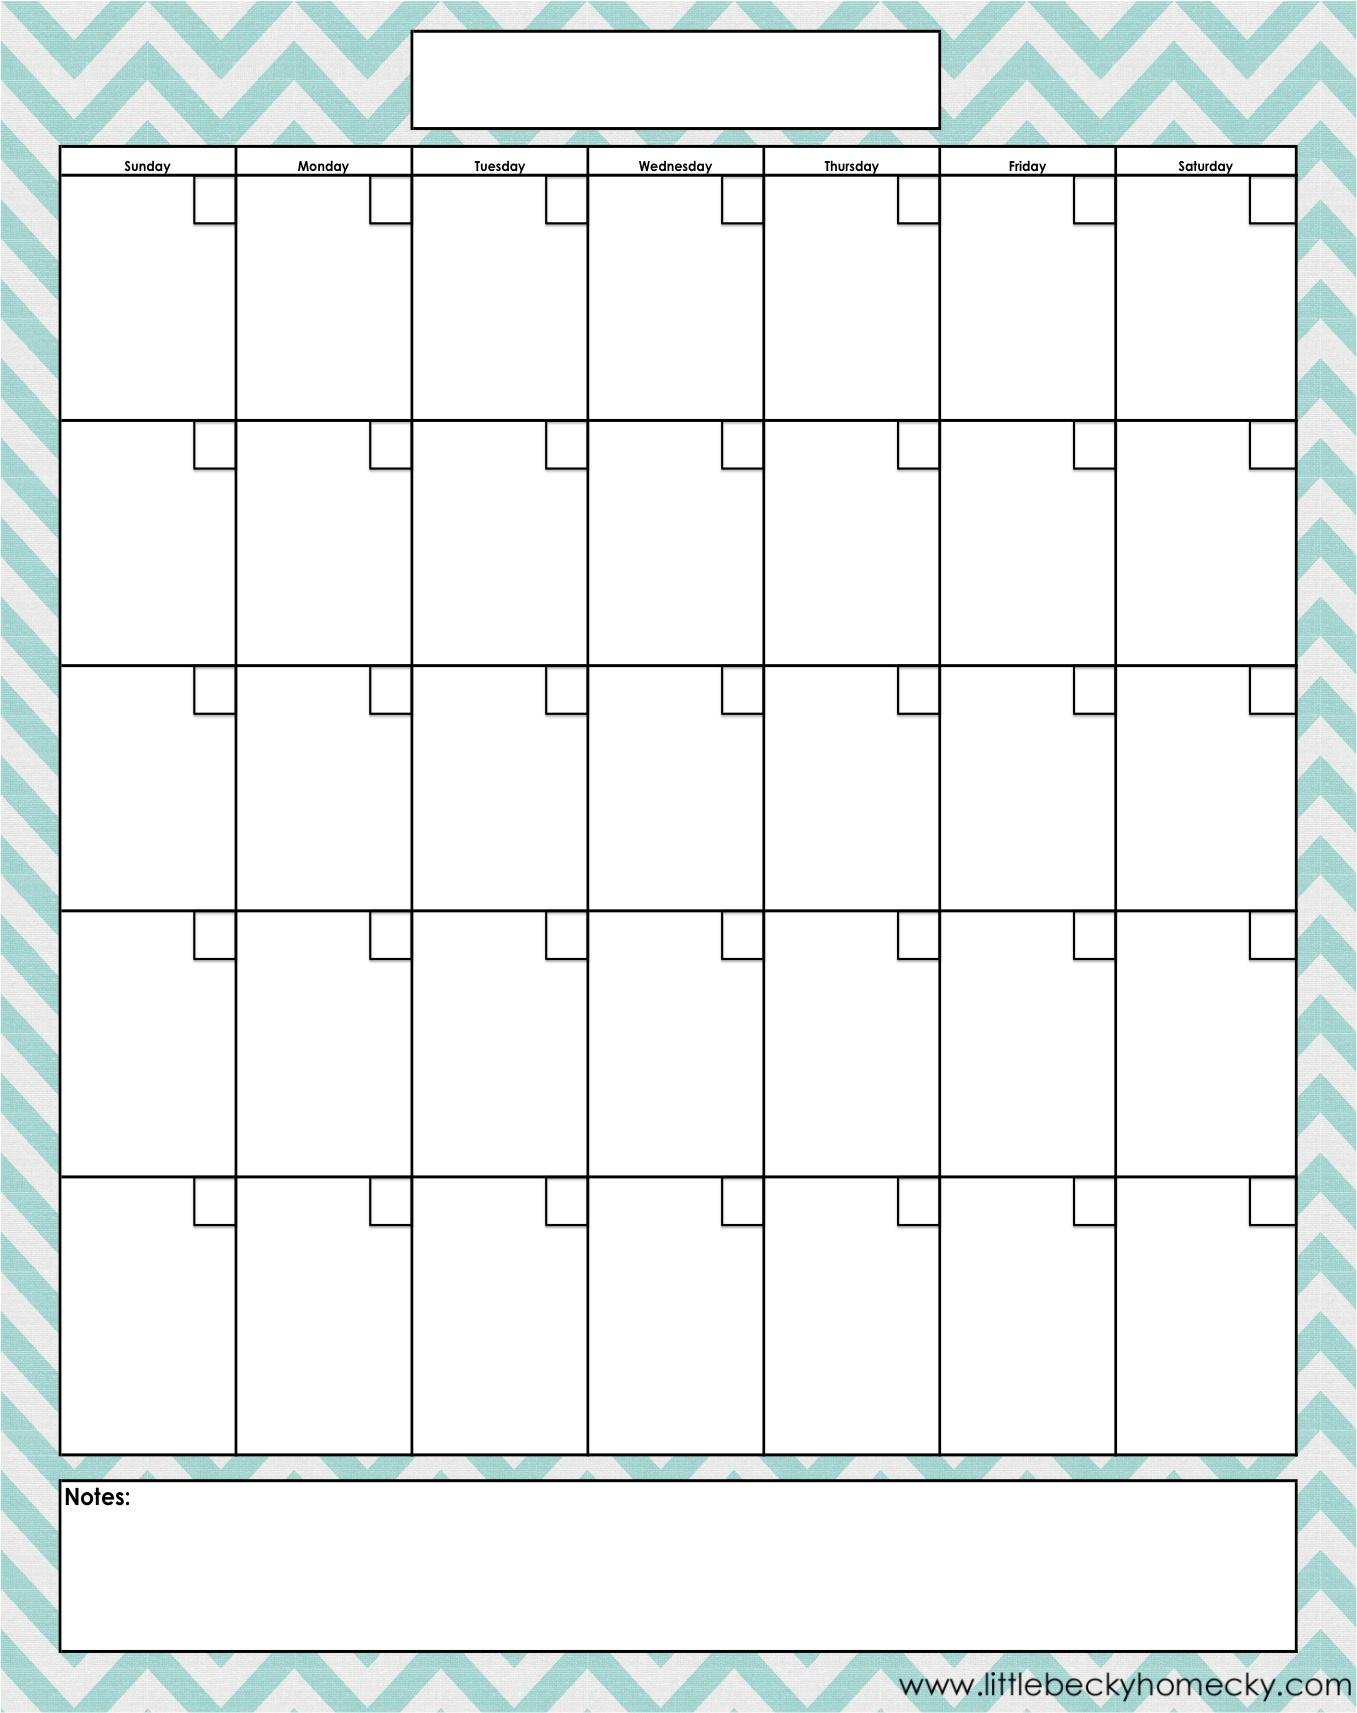 February 2019 - Page 3 - Template Calendar Design